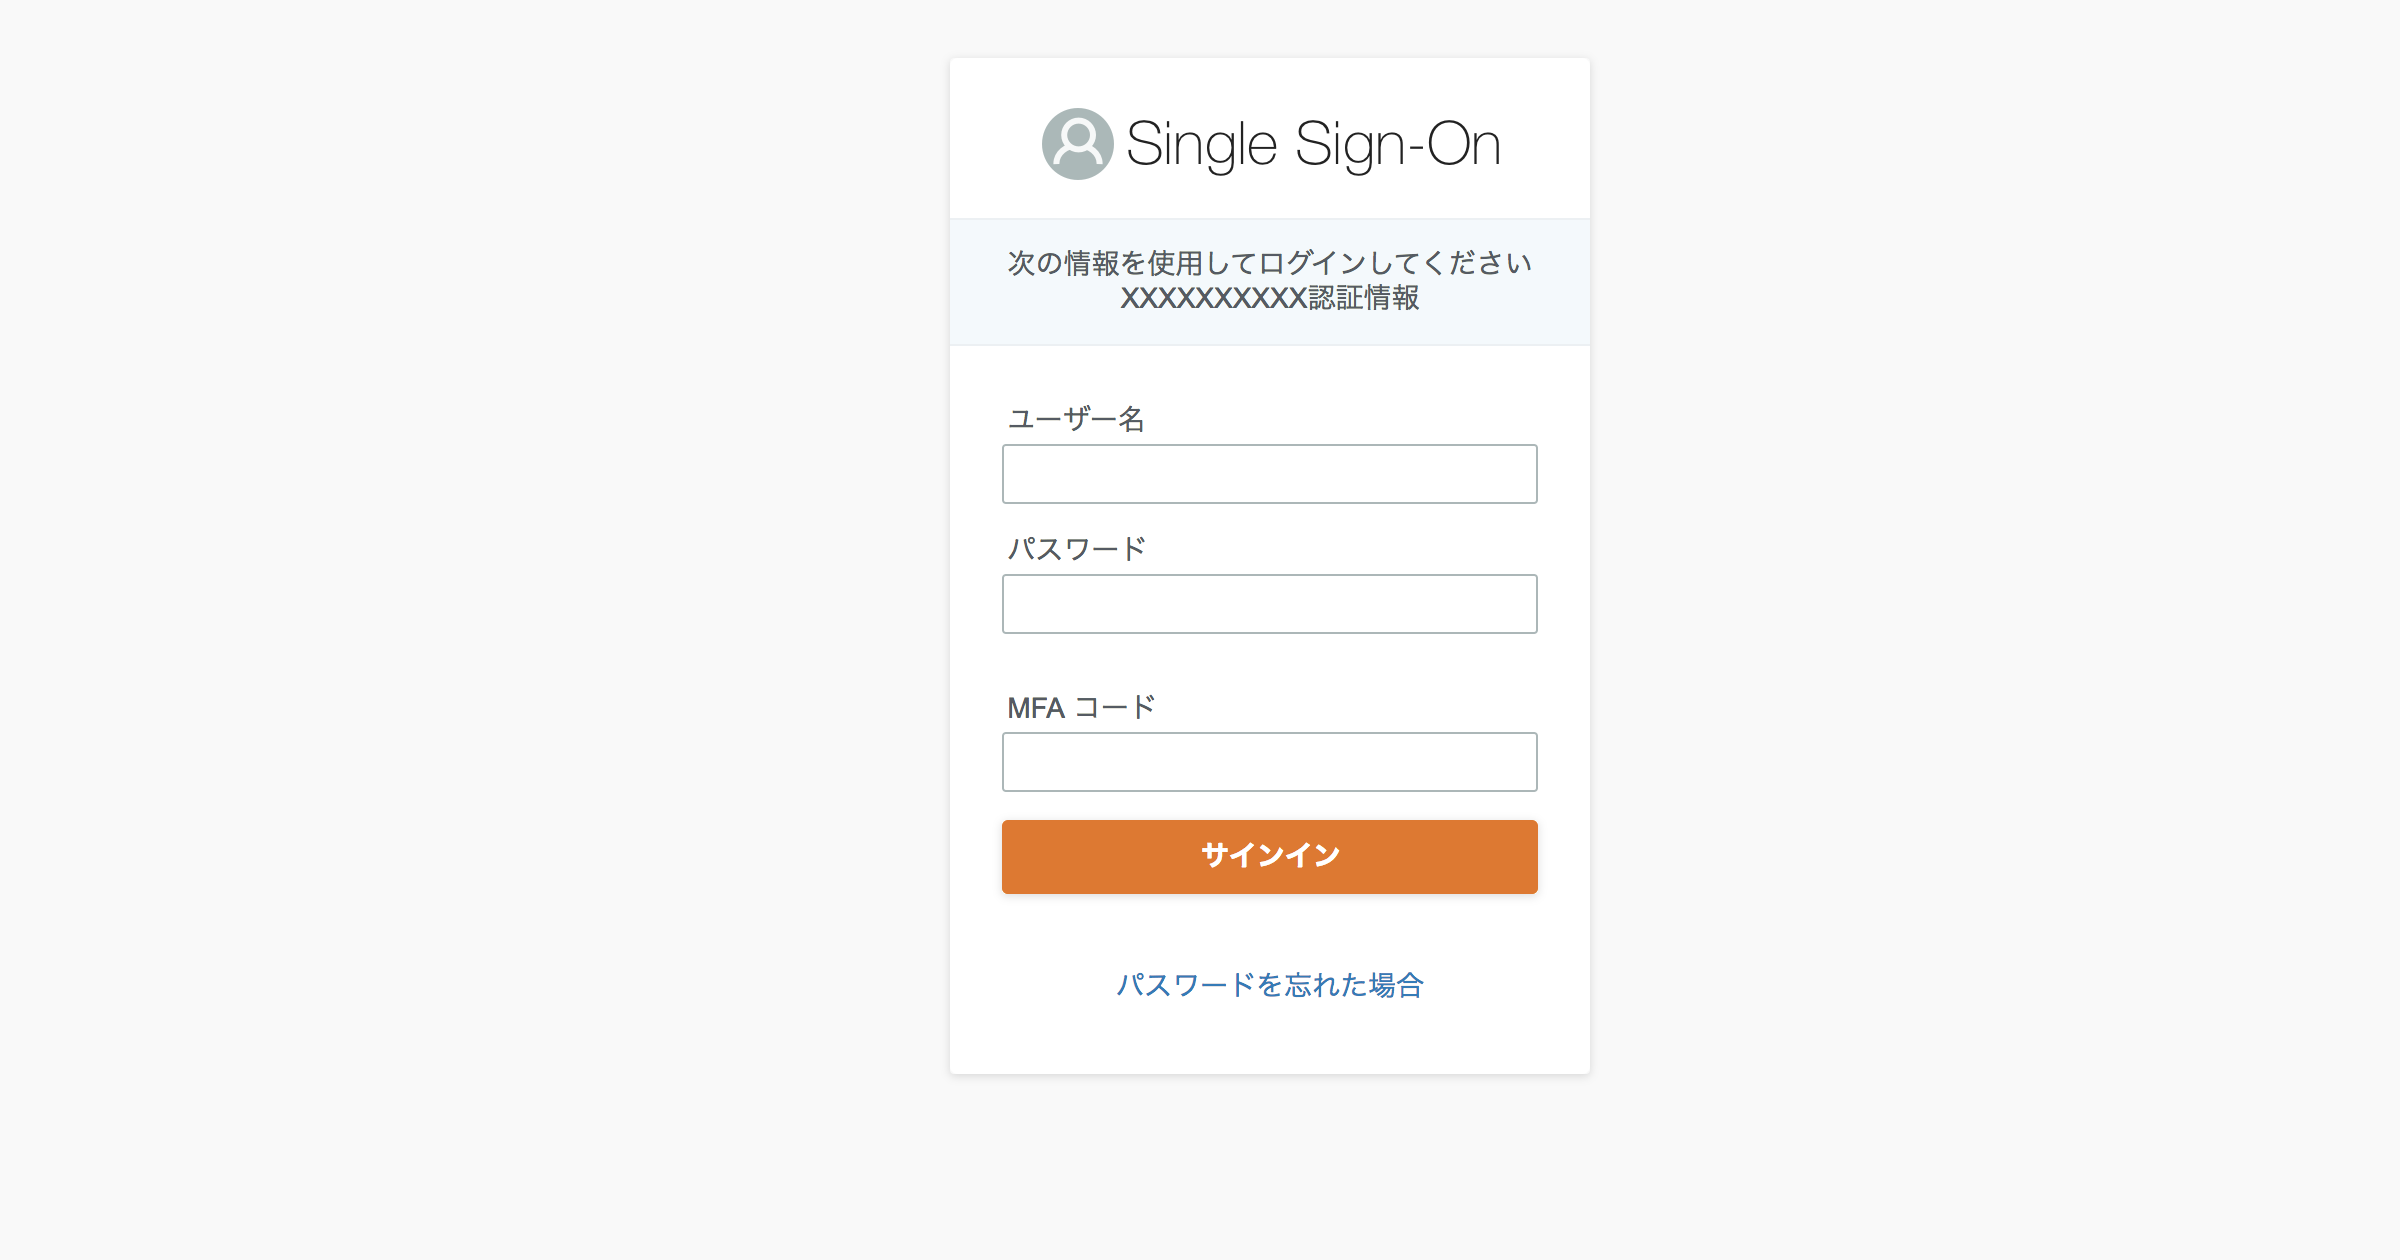 AWS Single Sign-On環境の構築を検討してみる